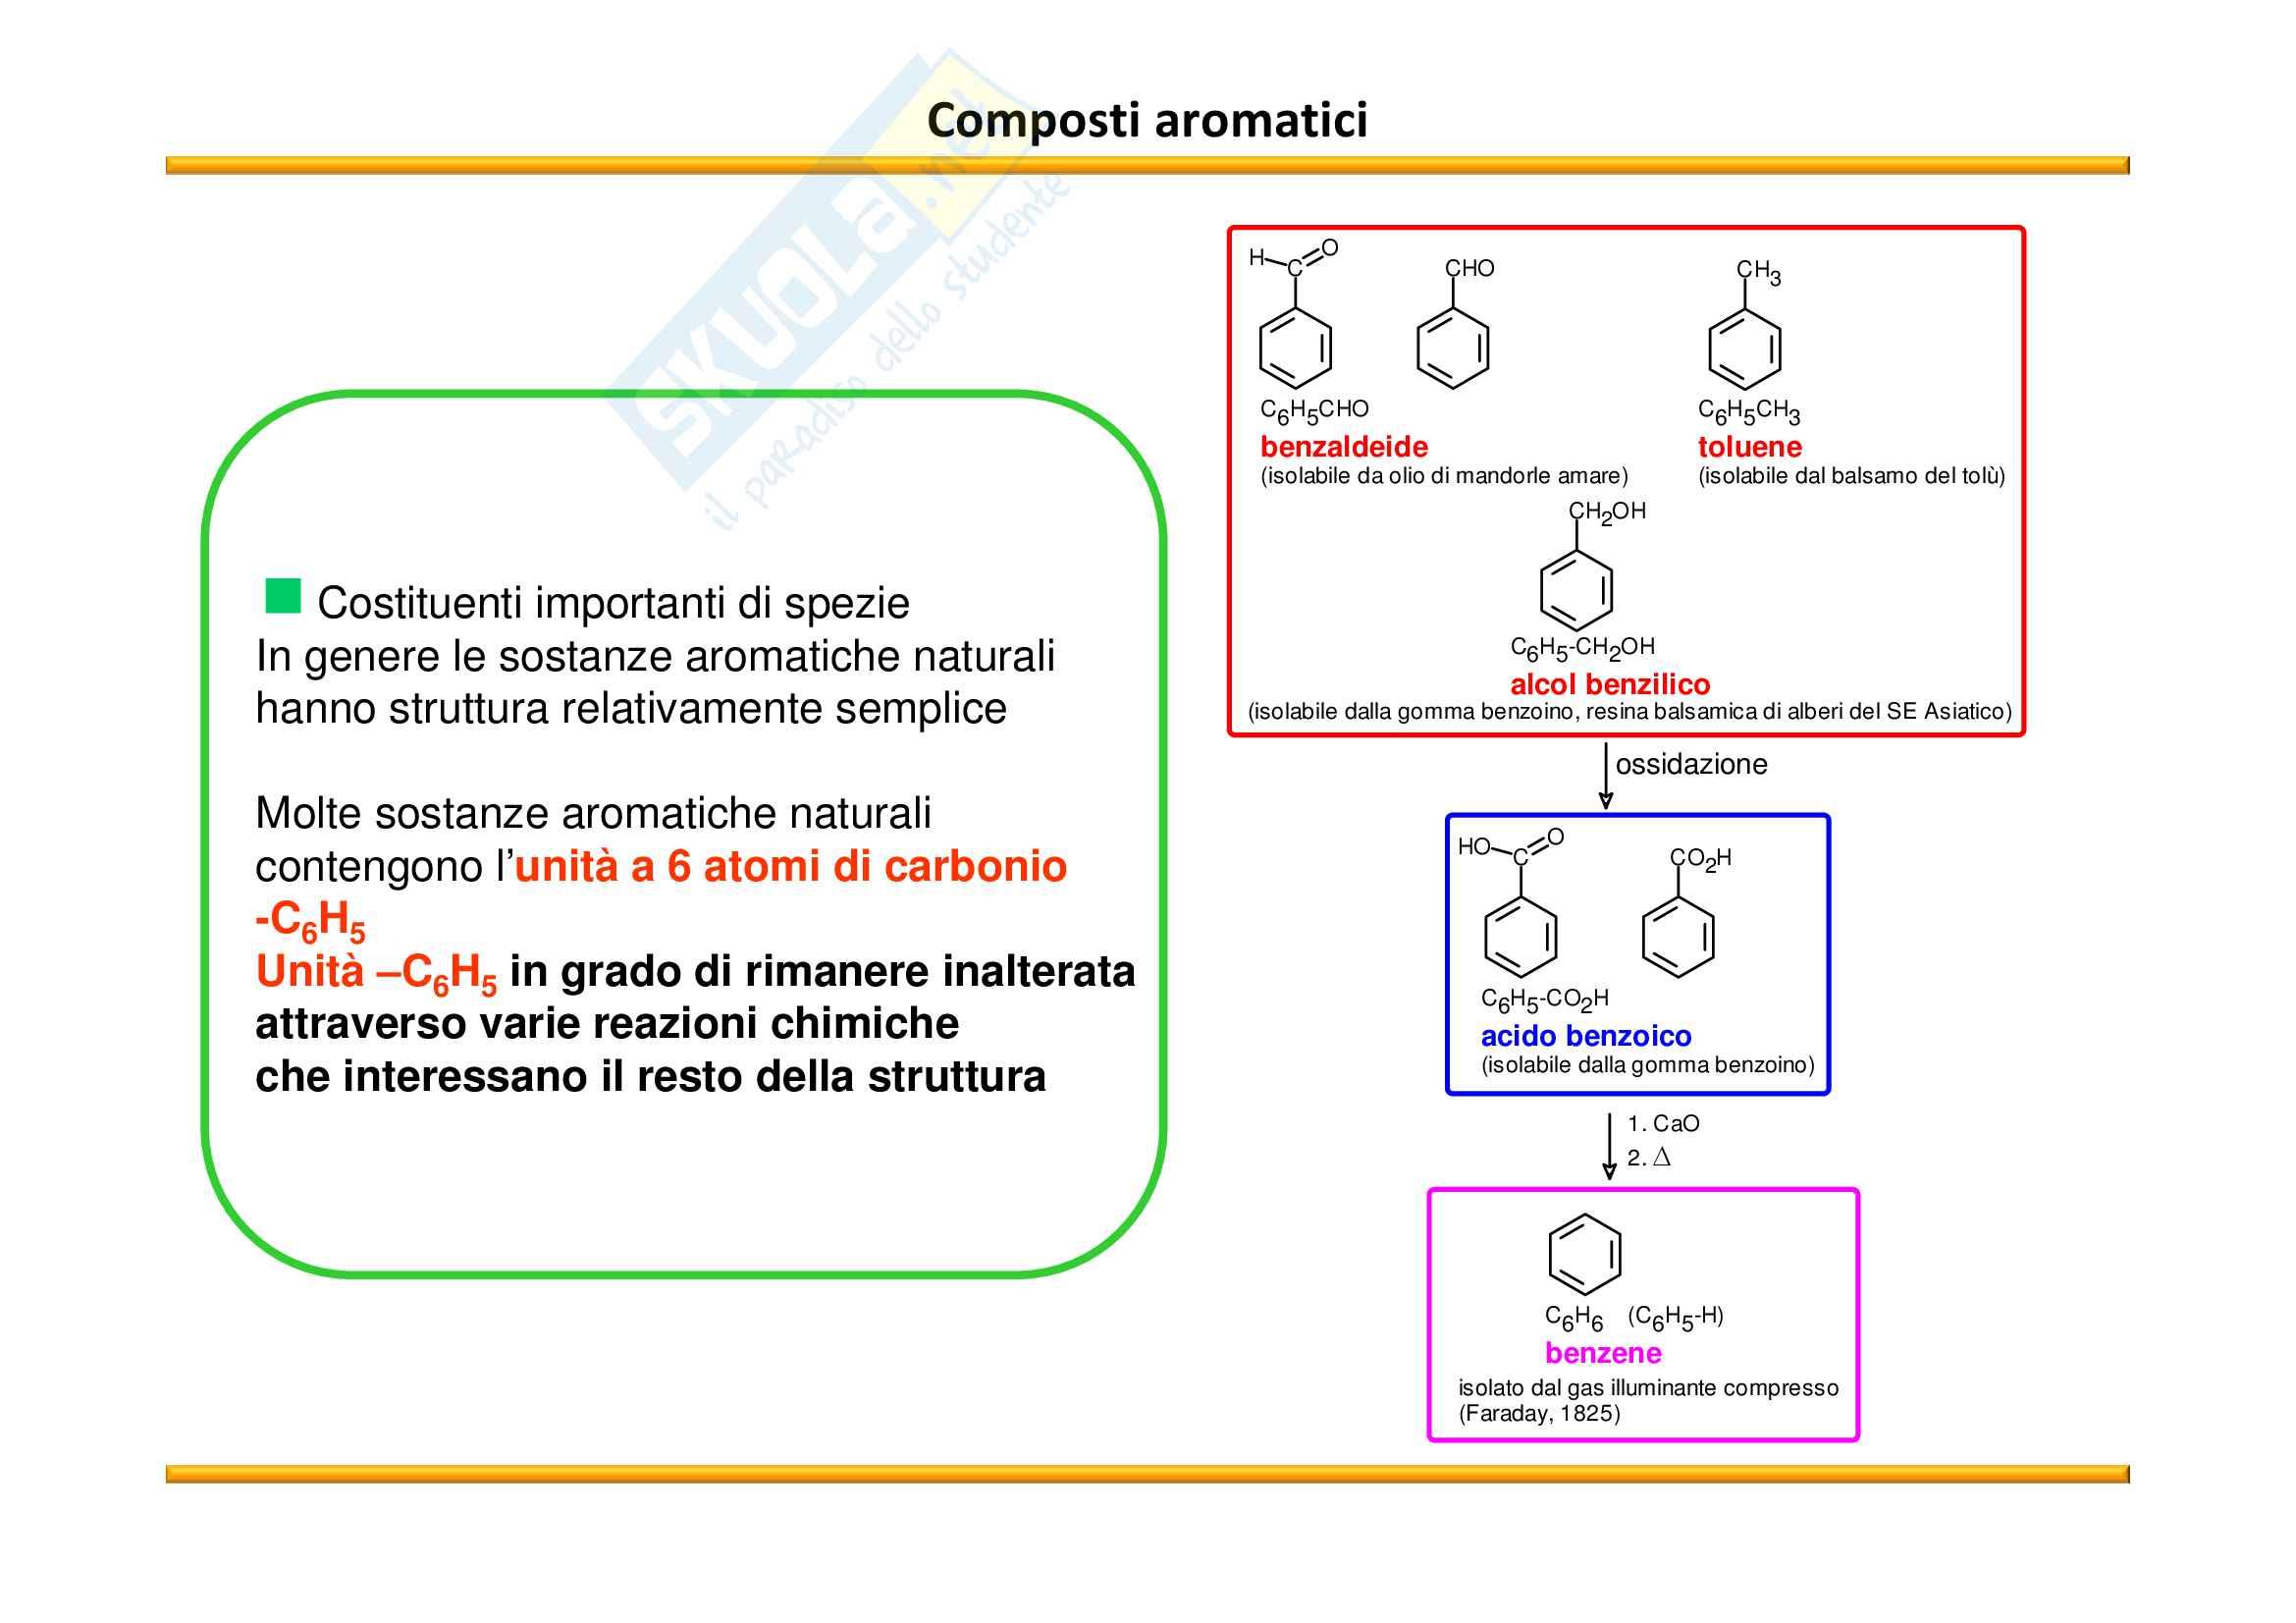 Chimica Organica: Composti aromatici